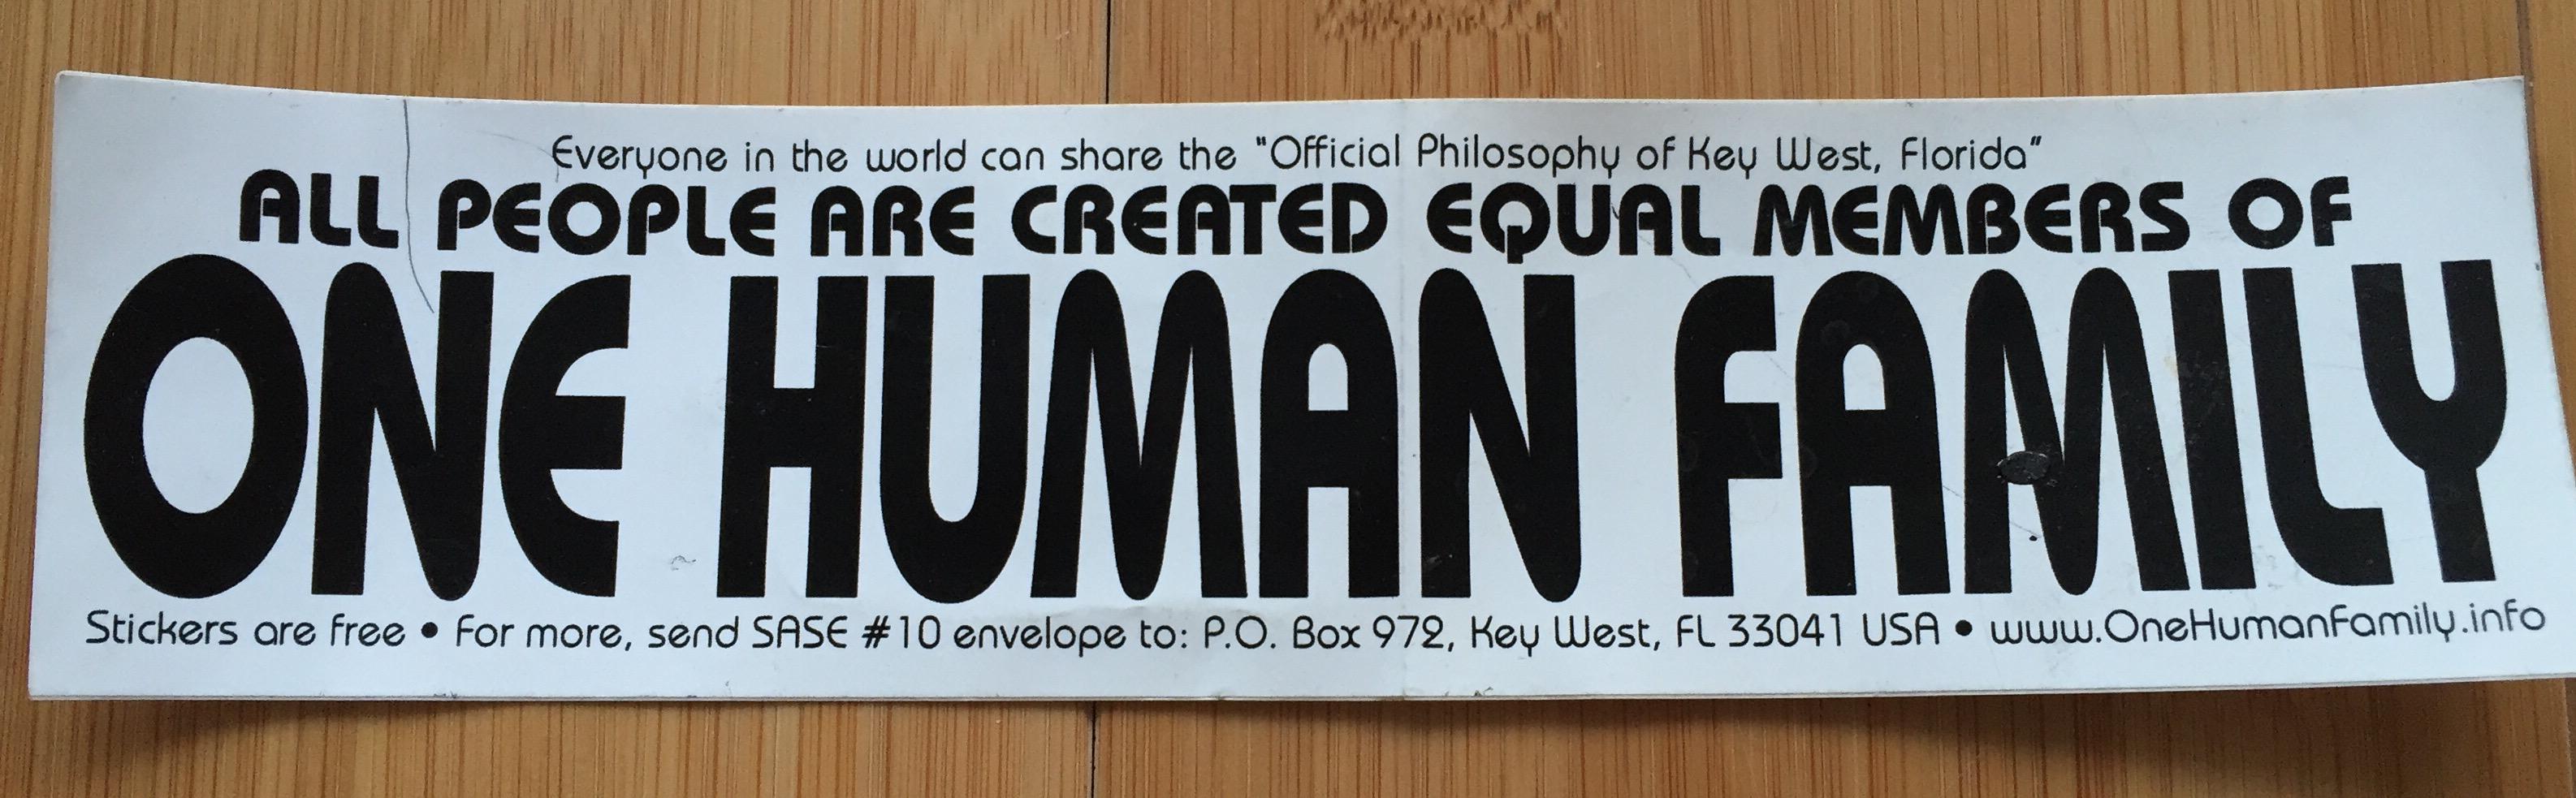 one-human-family.jpg (3172×983)